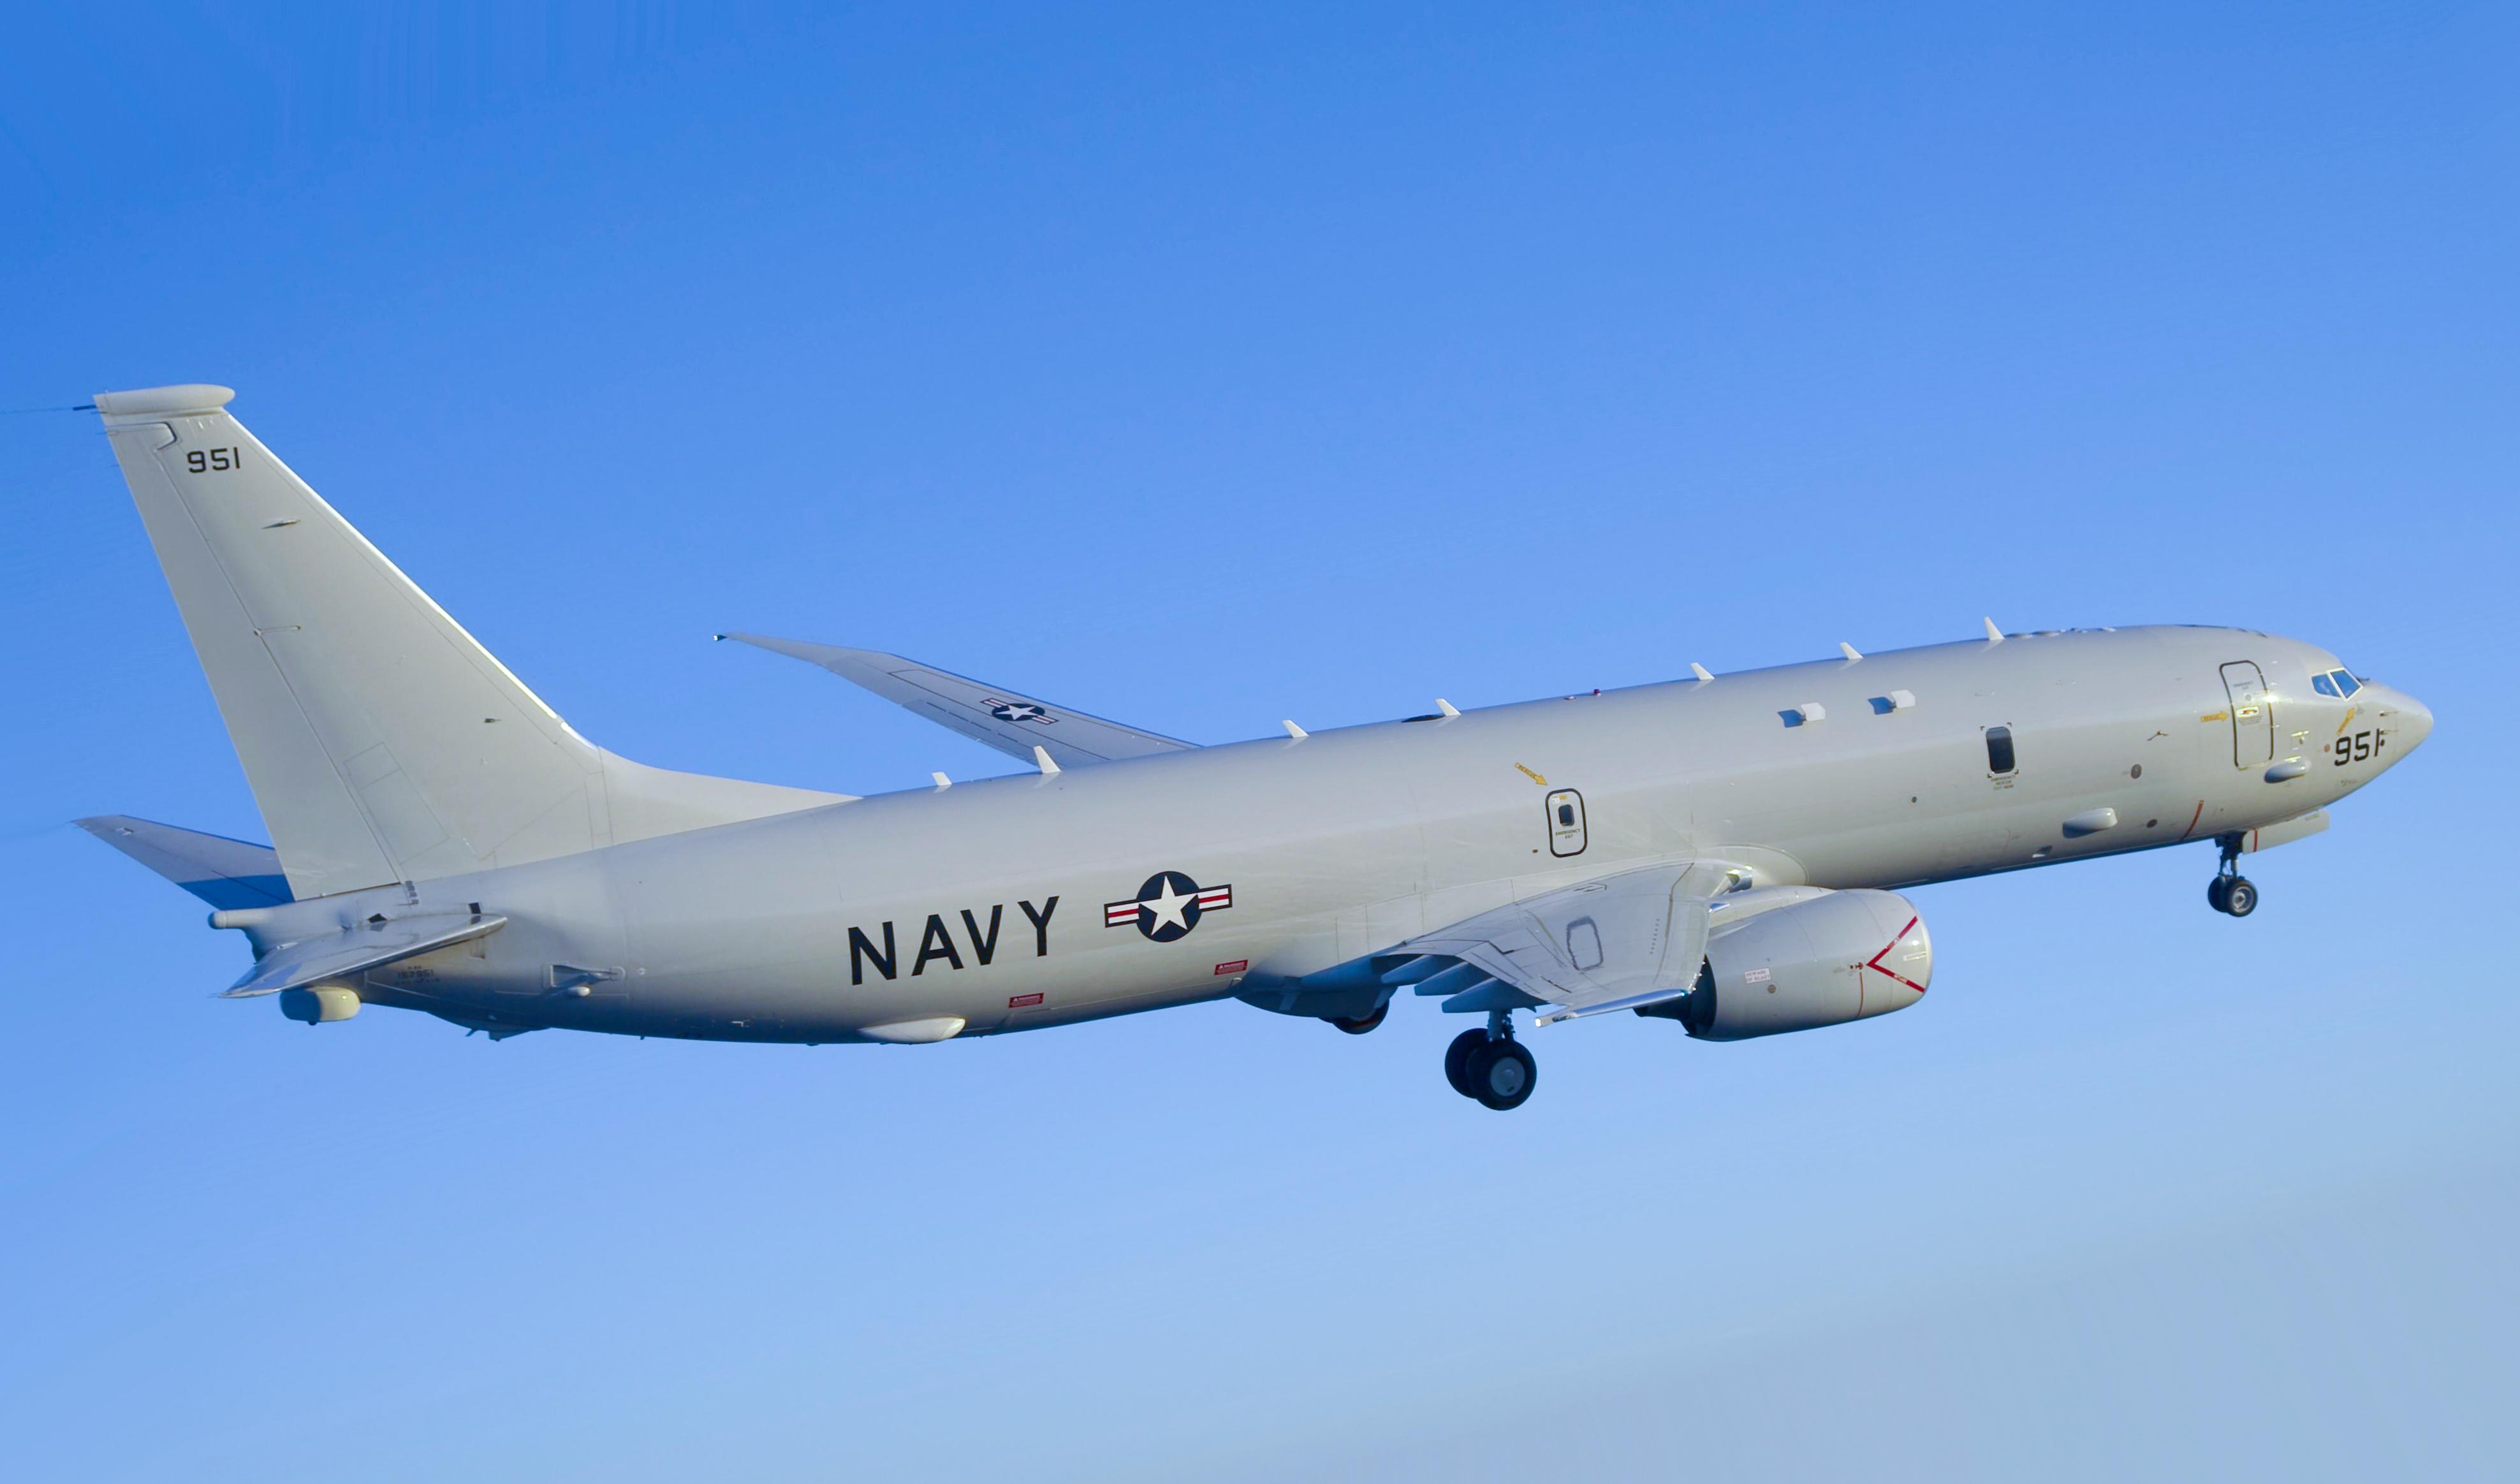 تعاقد البحريه الامريكيه علي دفعه جديده من الطائره  P-8A P-8A_Poseidon_VX-20_Squadron